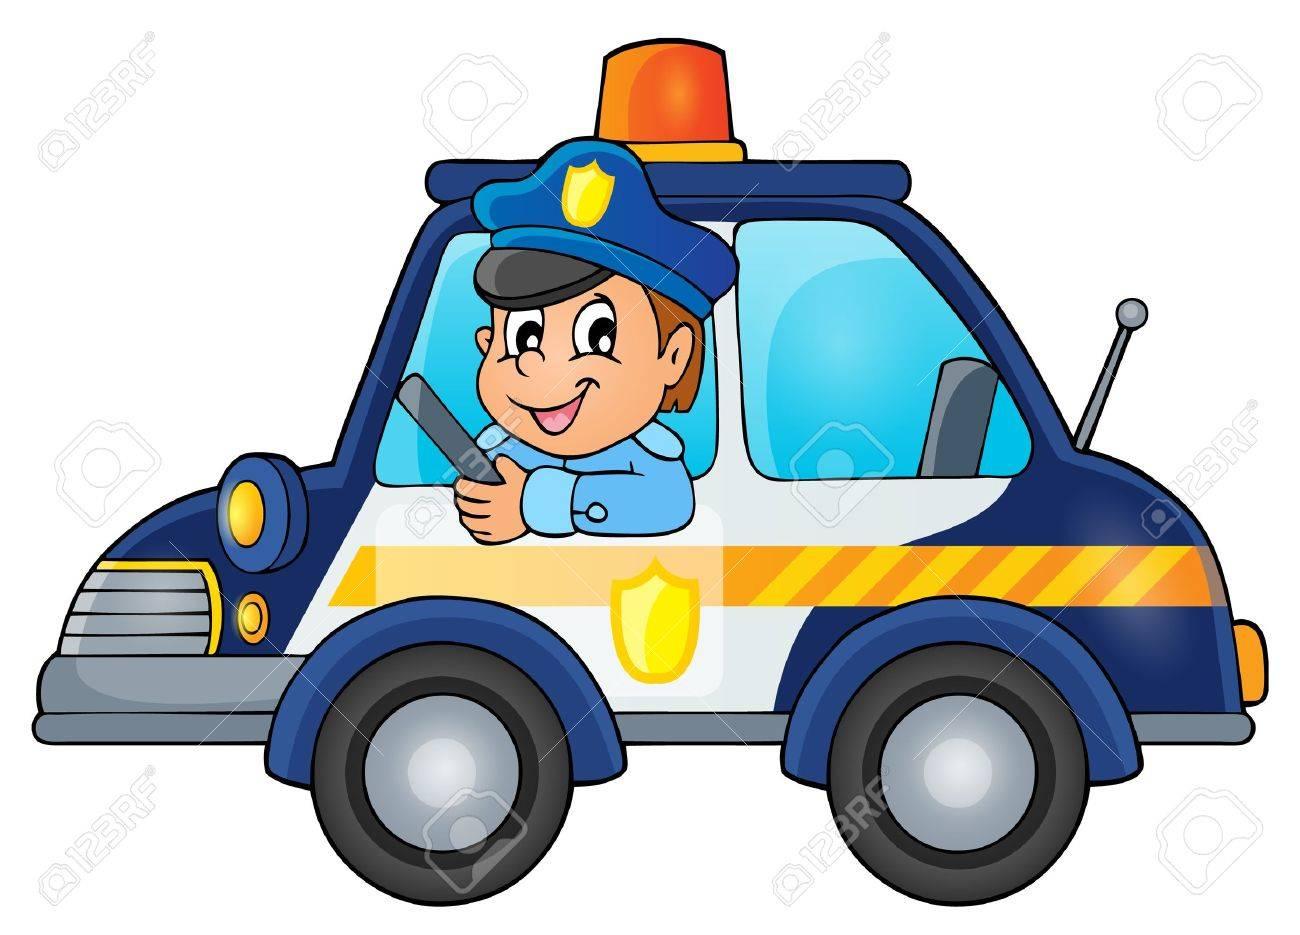 Police car theme image 1 - vector illustration. - 46608960